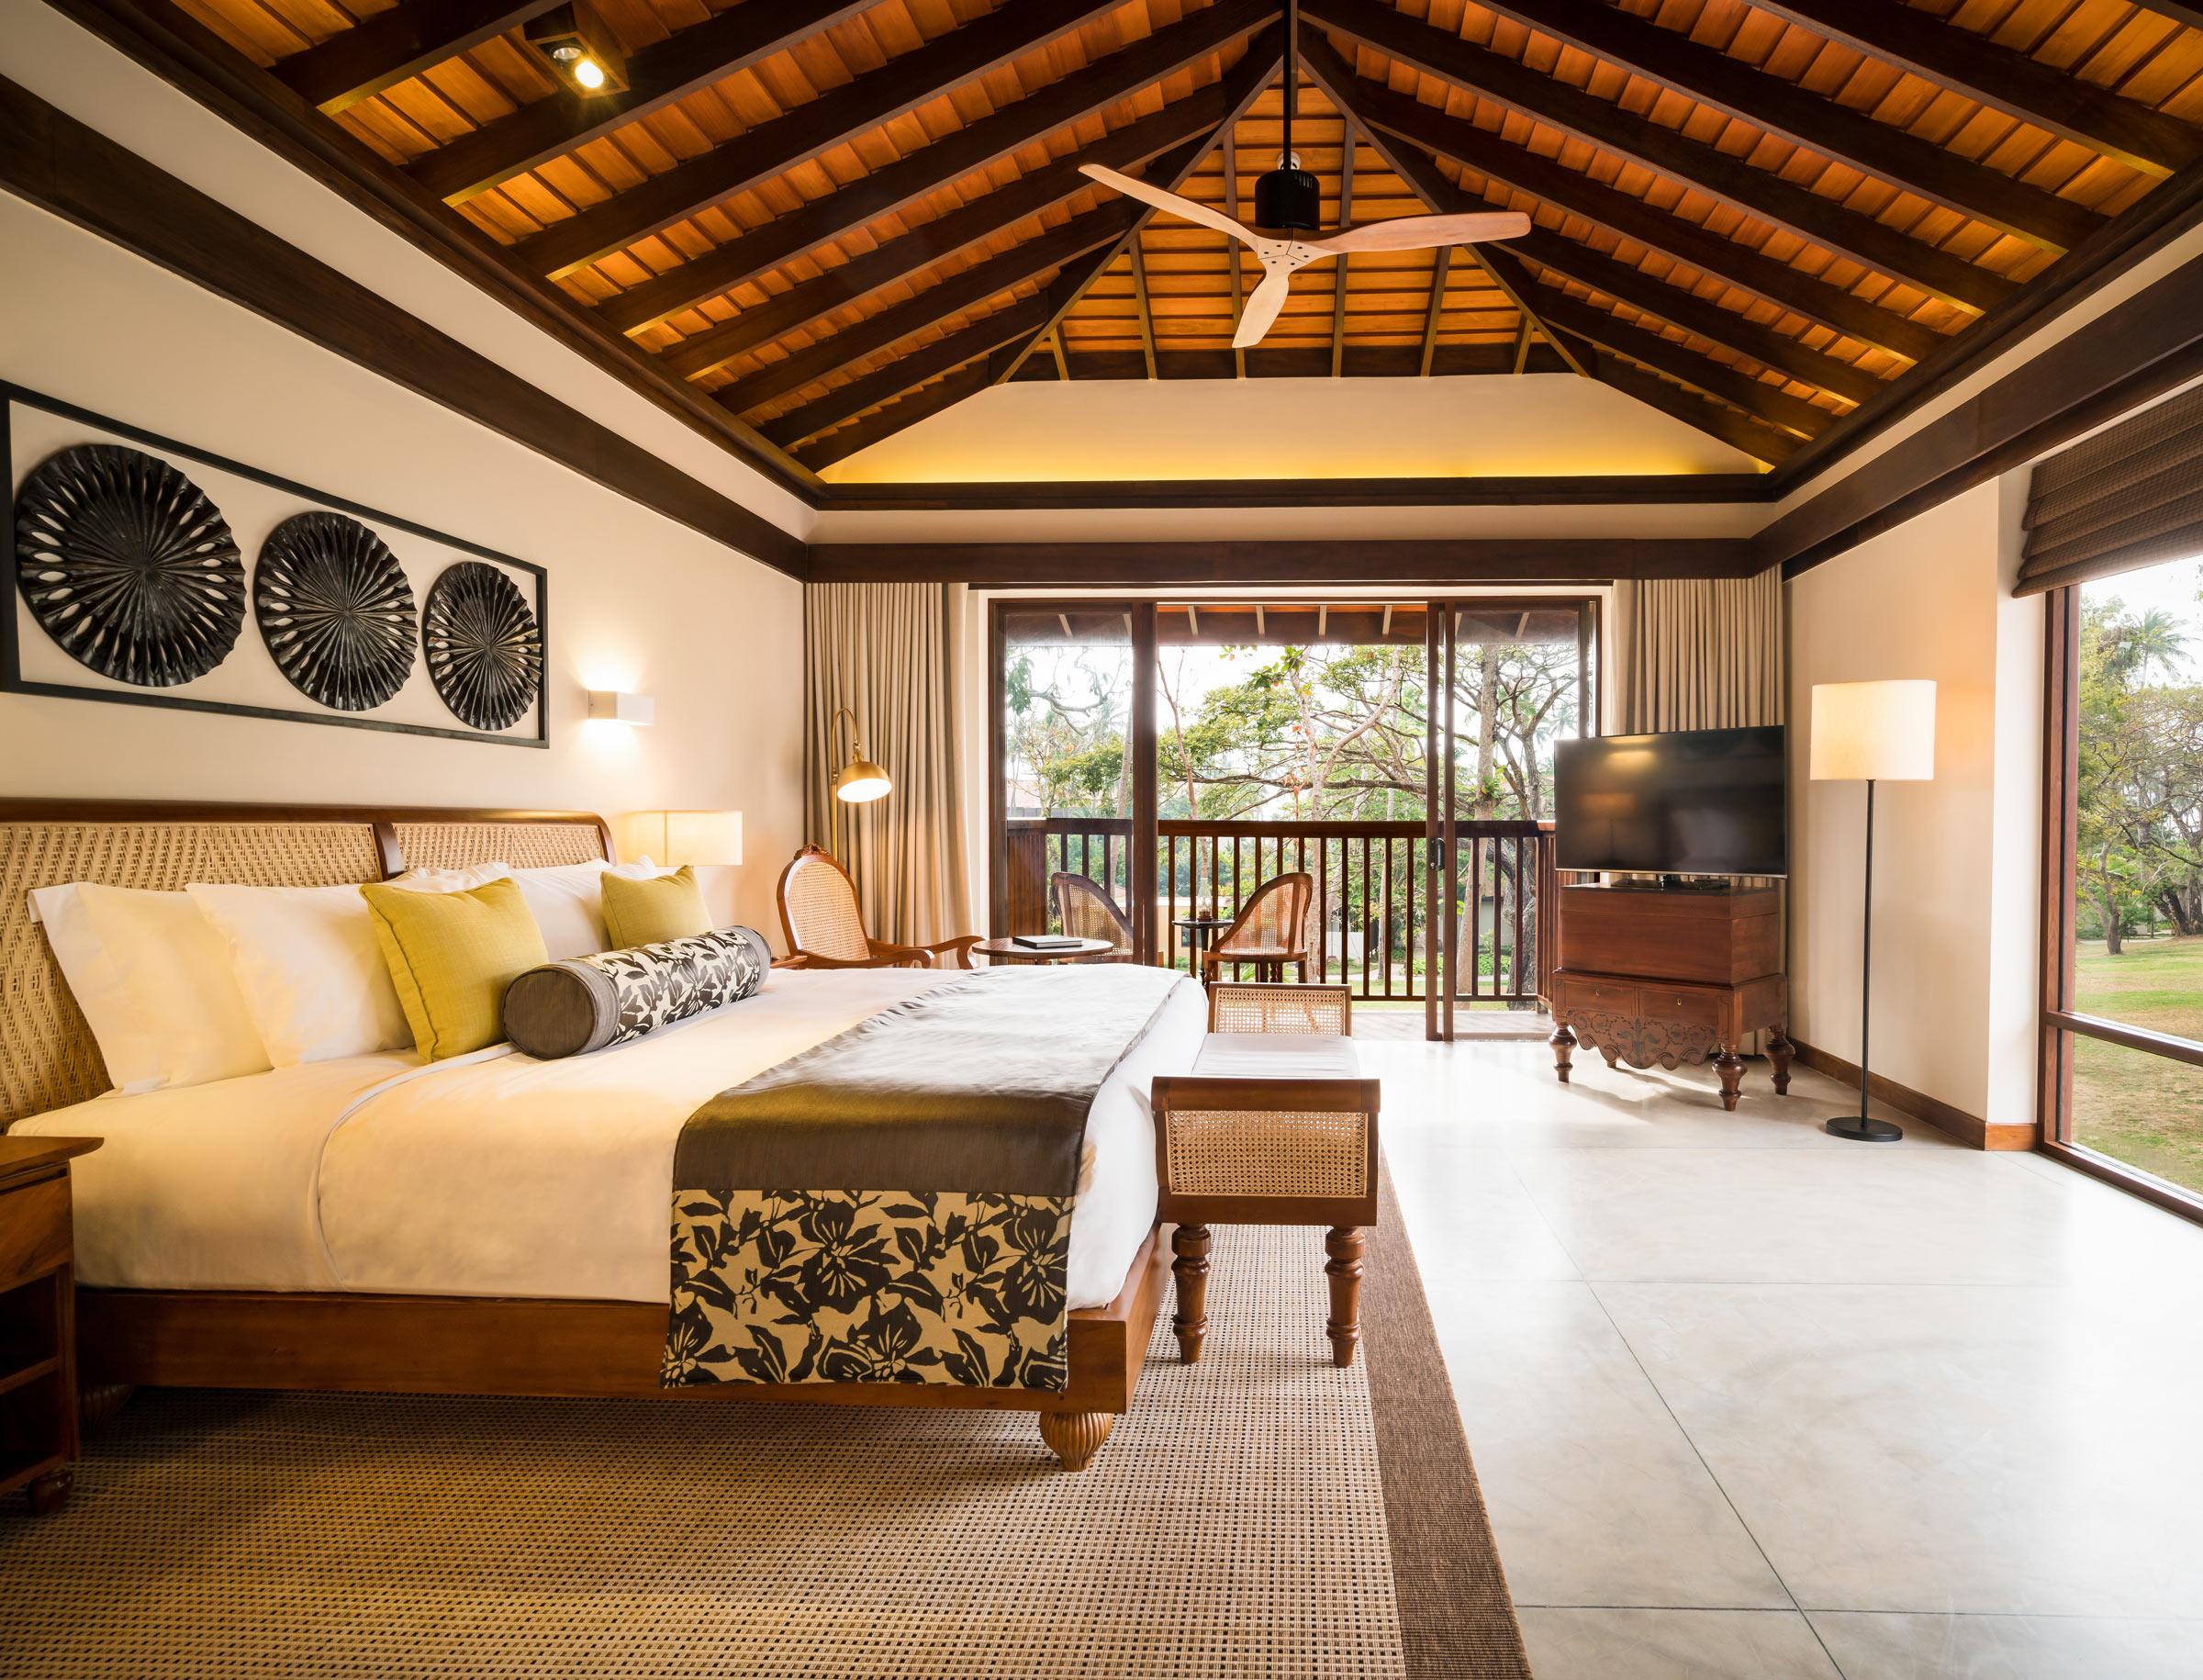 Anantara-Peace-Haven-Tangalle-Resort---2-Bedroom-Garden-Villa.jpg